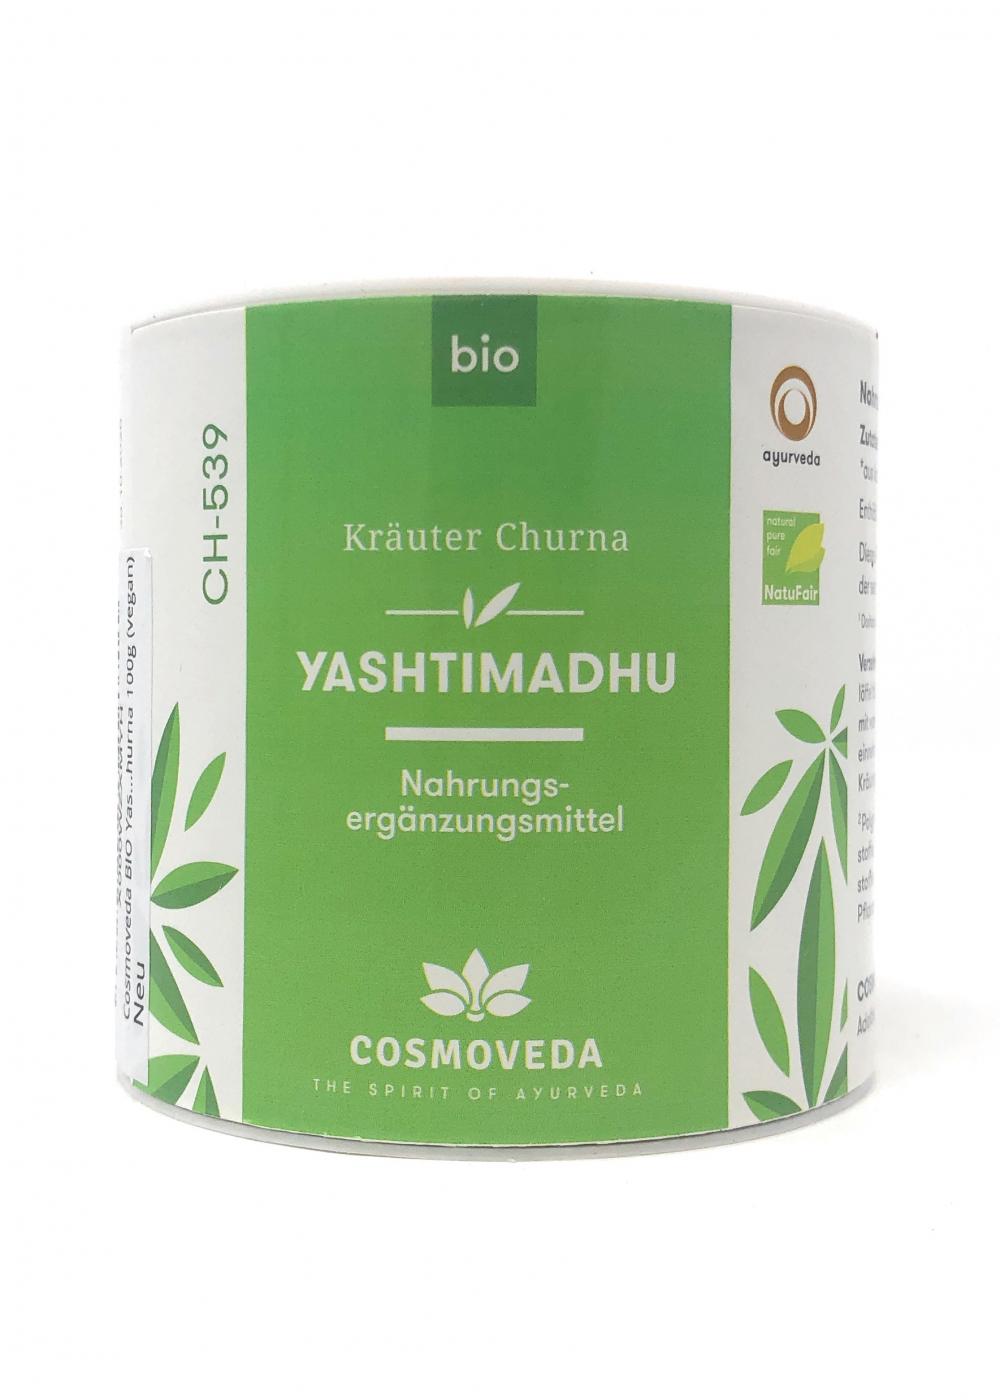 Cosmoveda BIO Yashtimadhu Churna (Süßholz Wurzelpulver) 100g Dose (vegan)